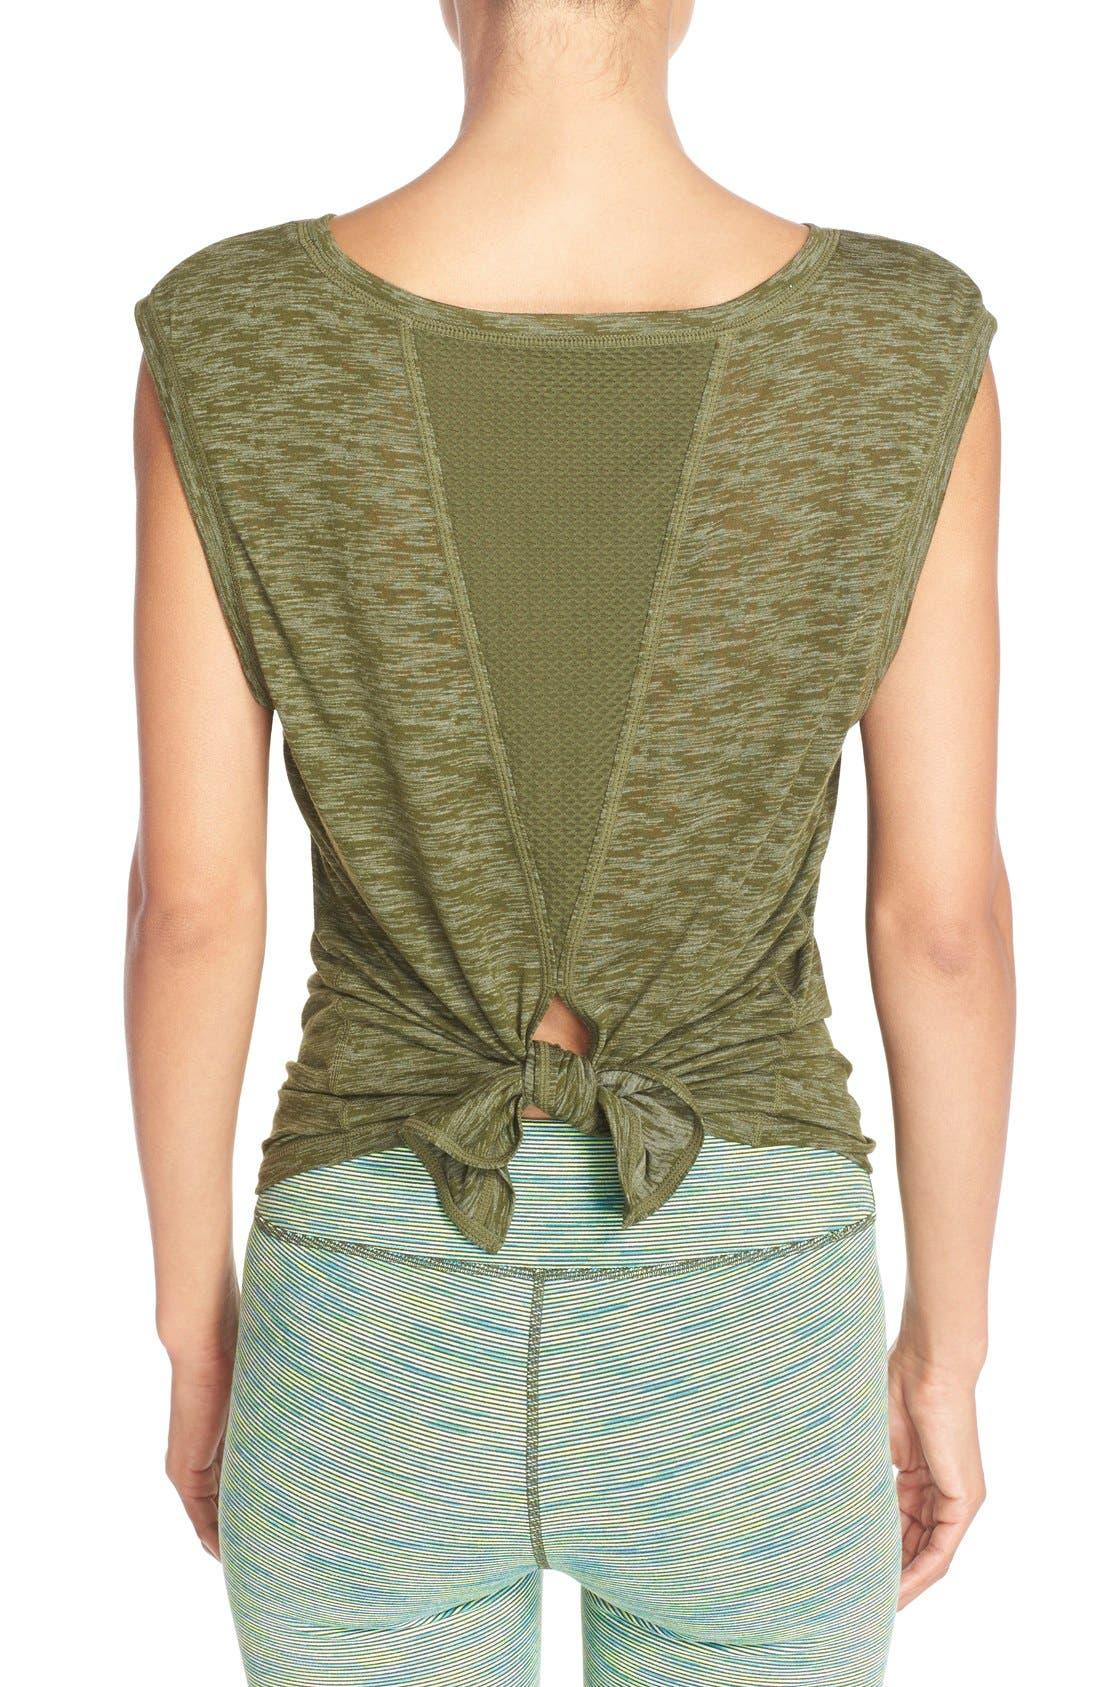 Main Image - Zella 'Luna' Convertible Tie Tee